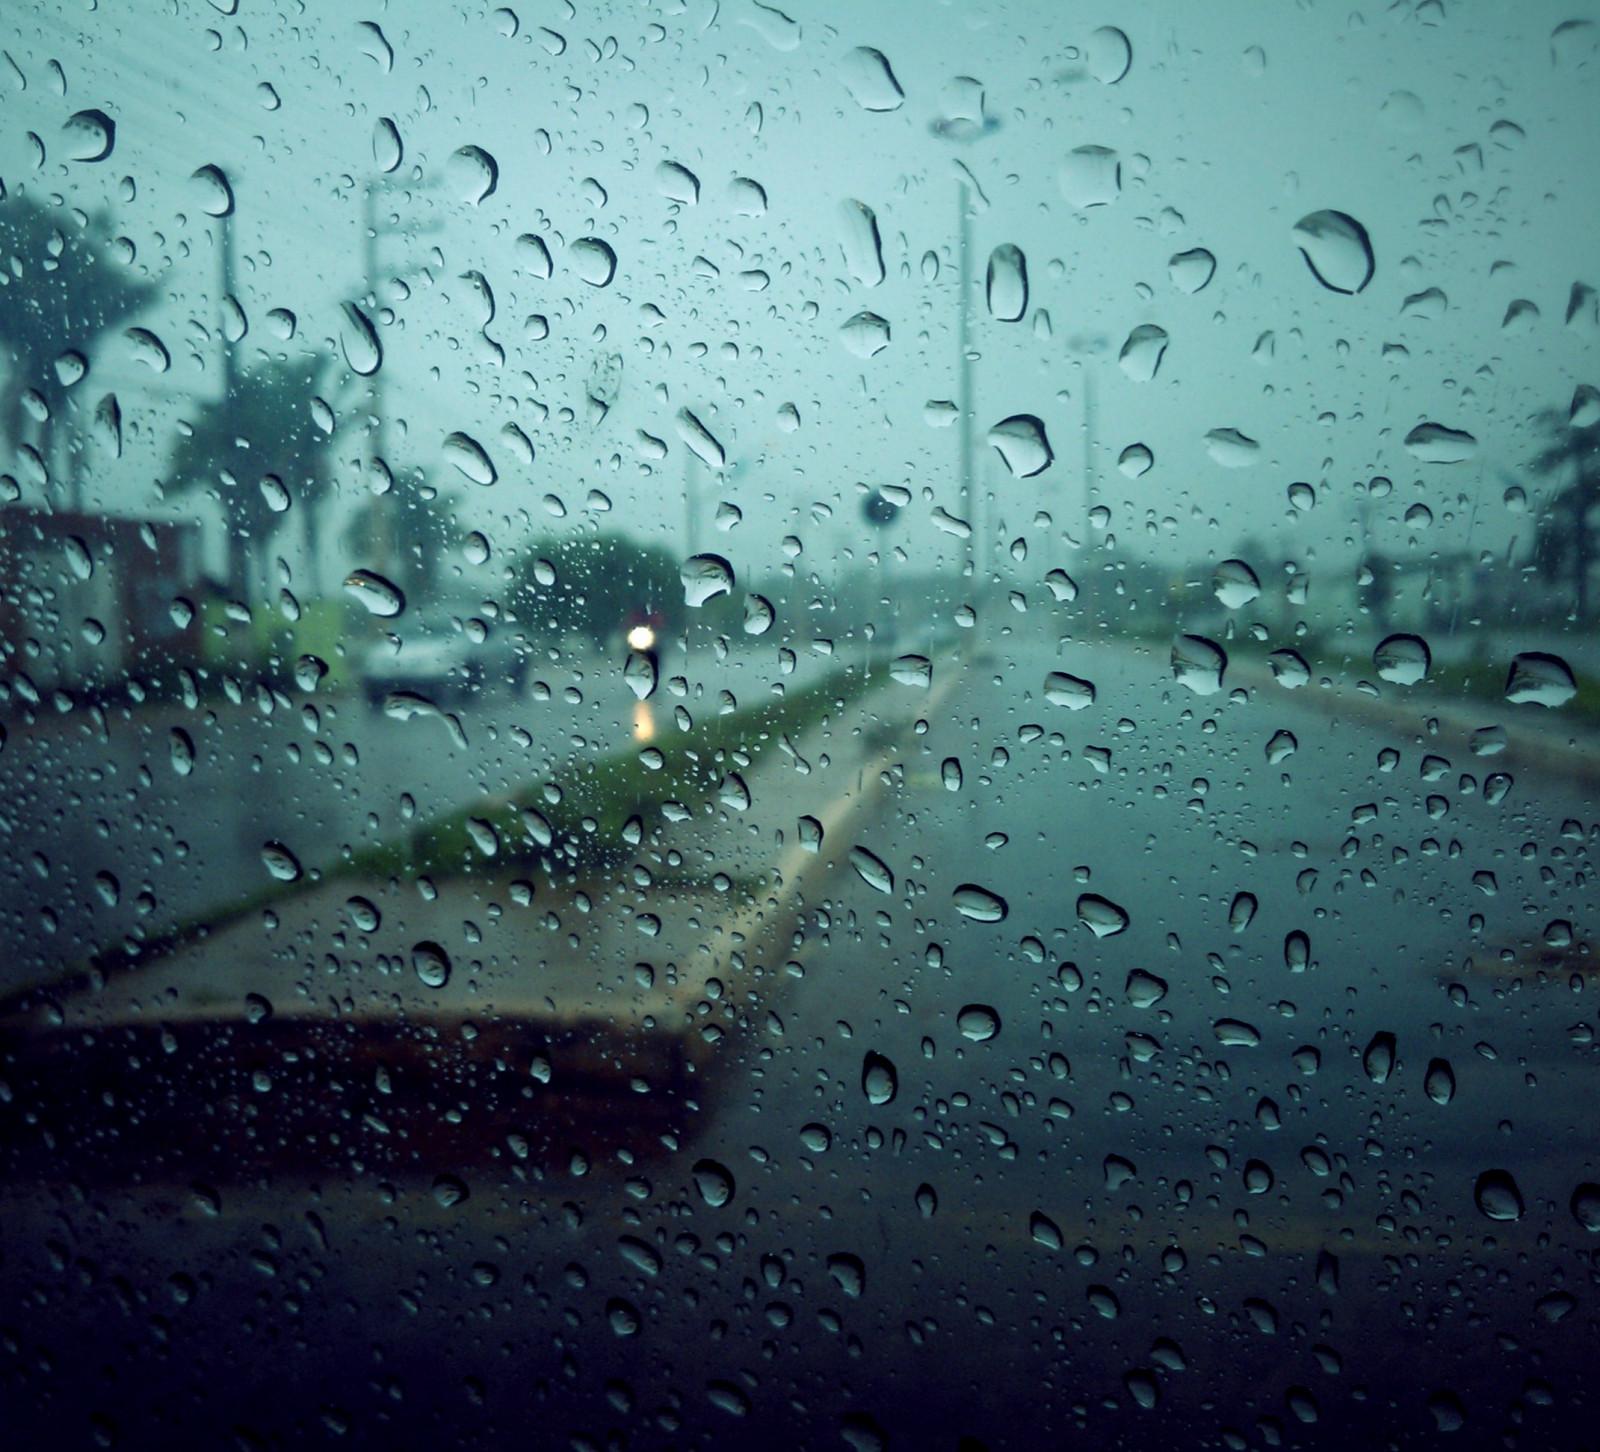 Картинка дождя на стекле